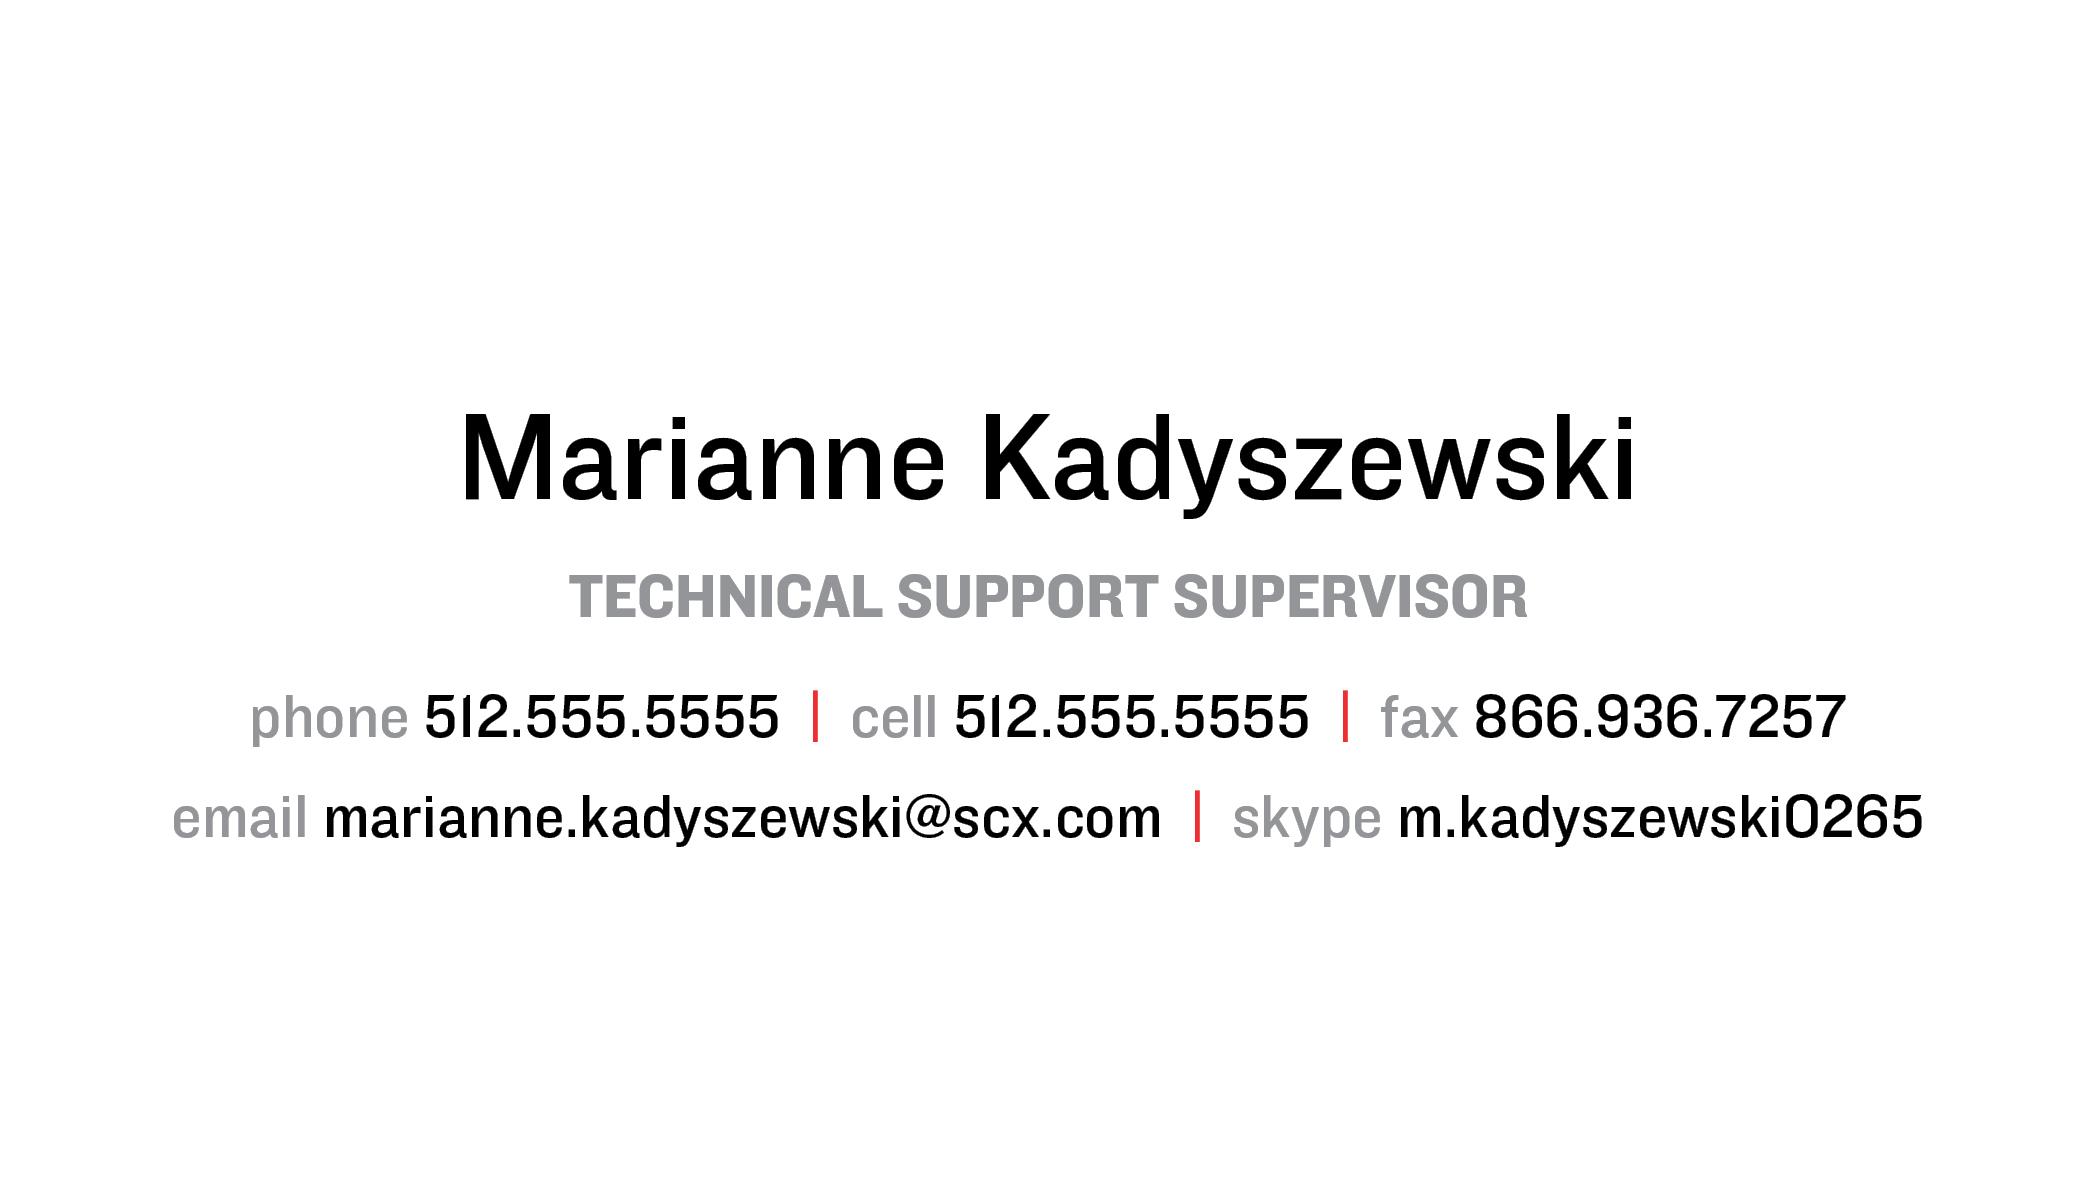 SC business card design concepts5.jpg